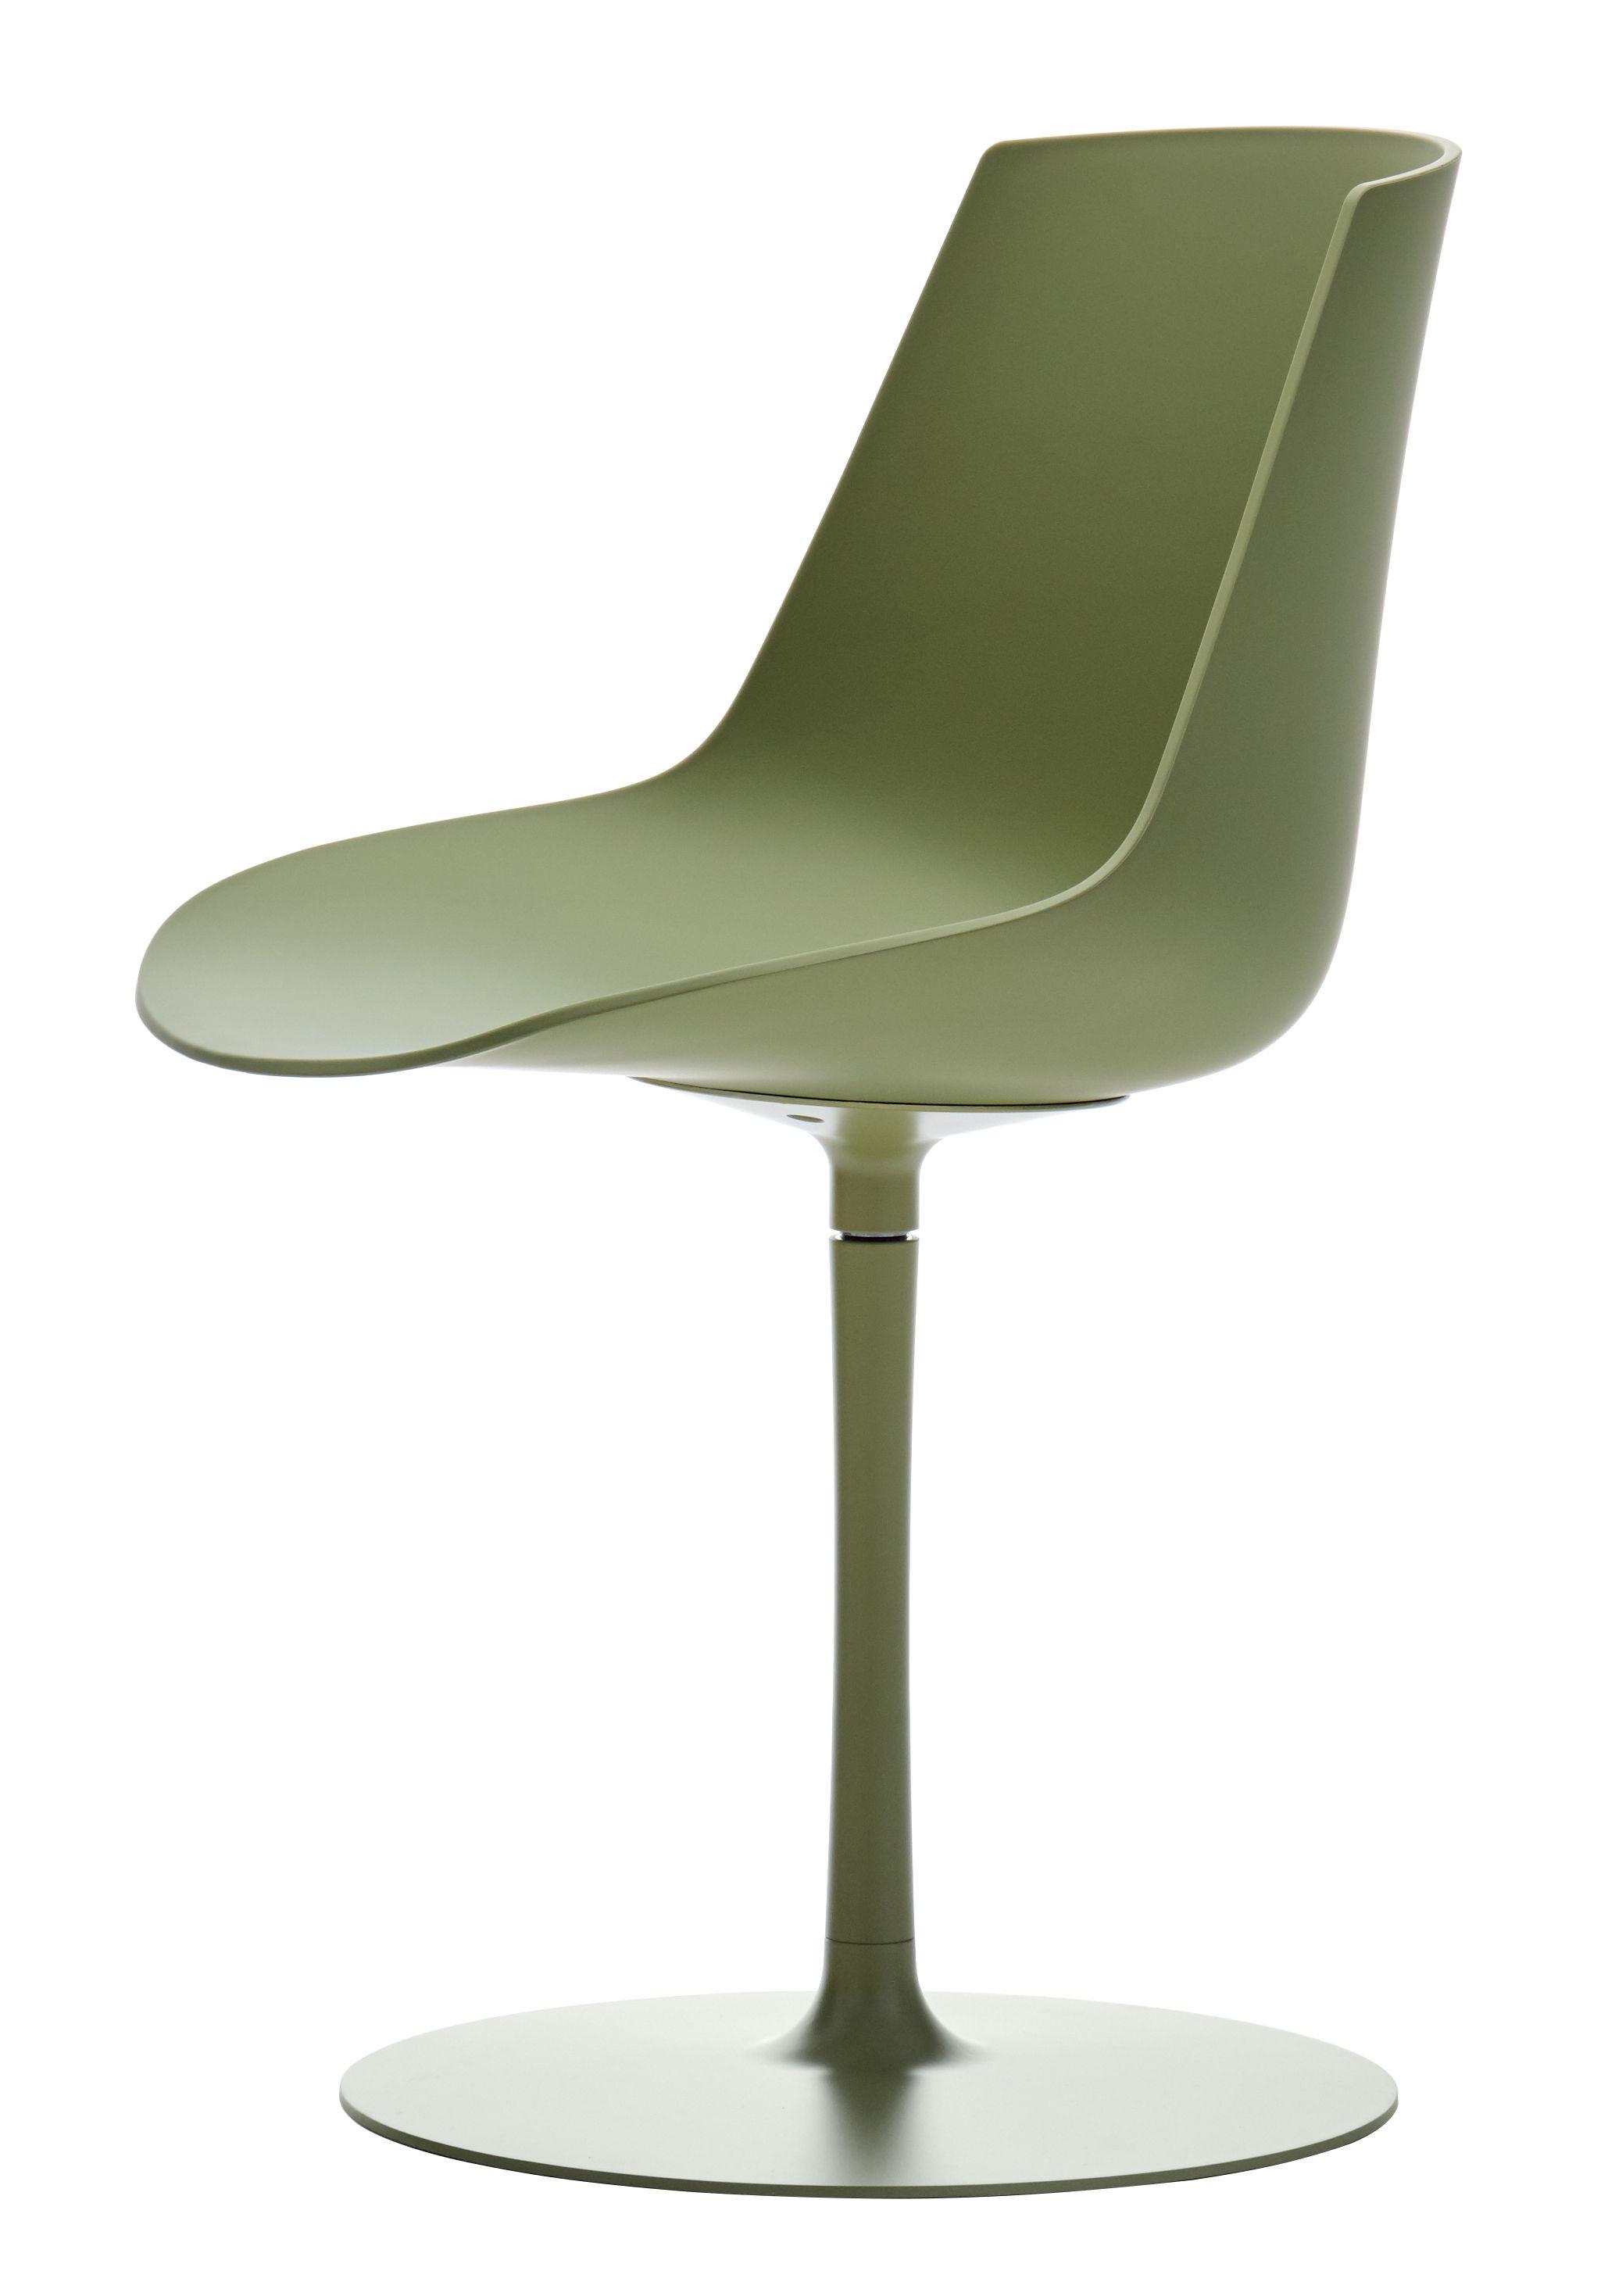 chaise pivotante flow color pied central olive mdf italia. Black Bedroom Furniture Sets. Home Design Ideas